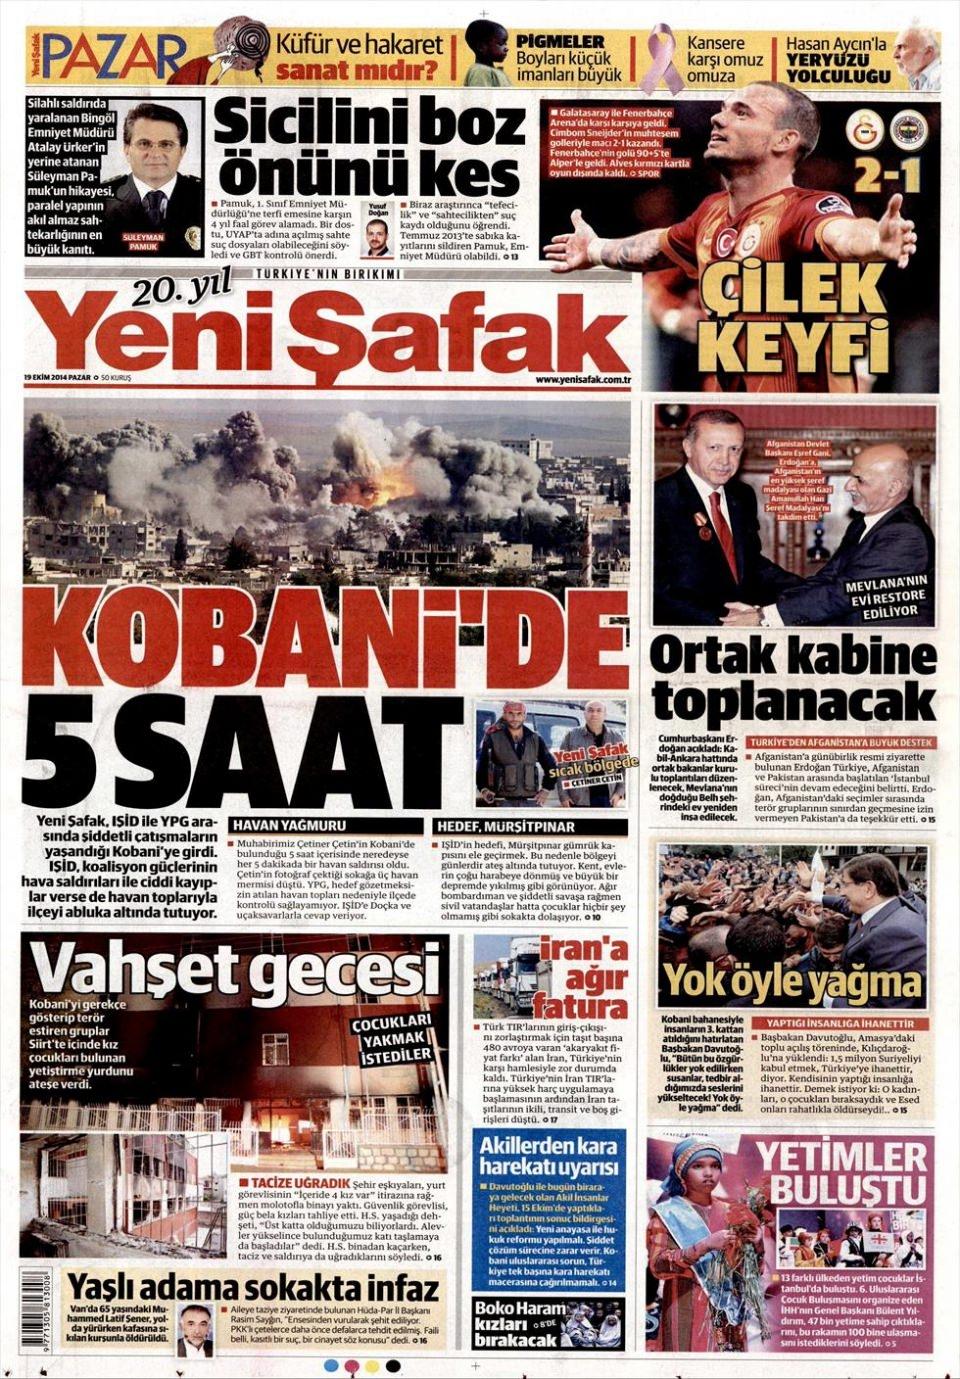 19 Ekim 2014 gazete manşetleri 7